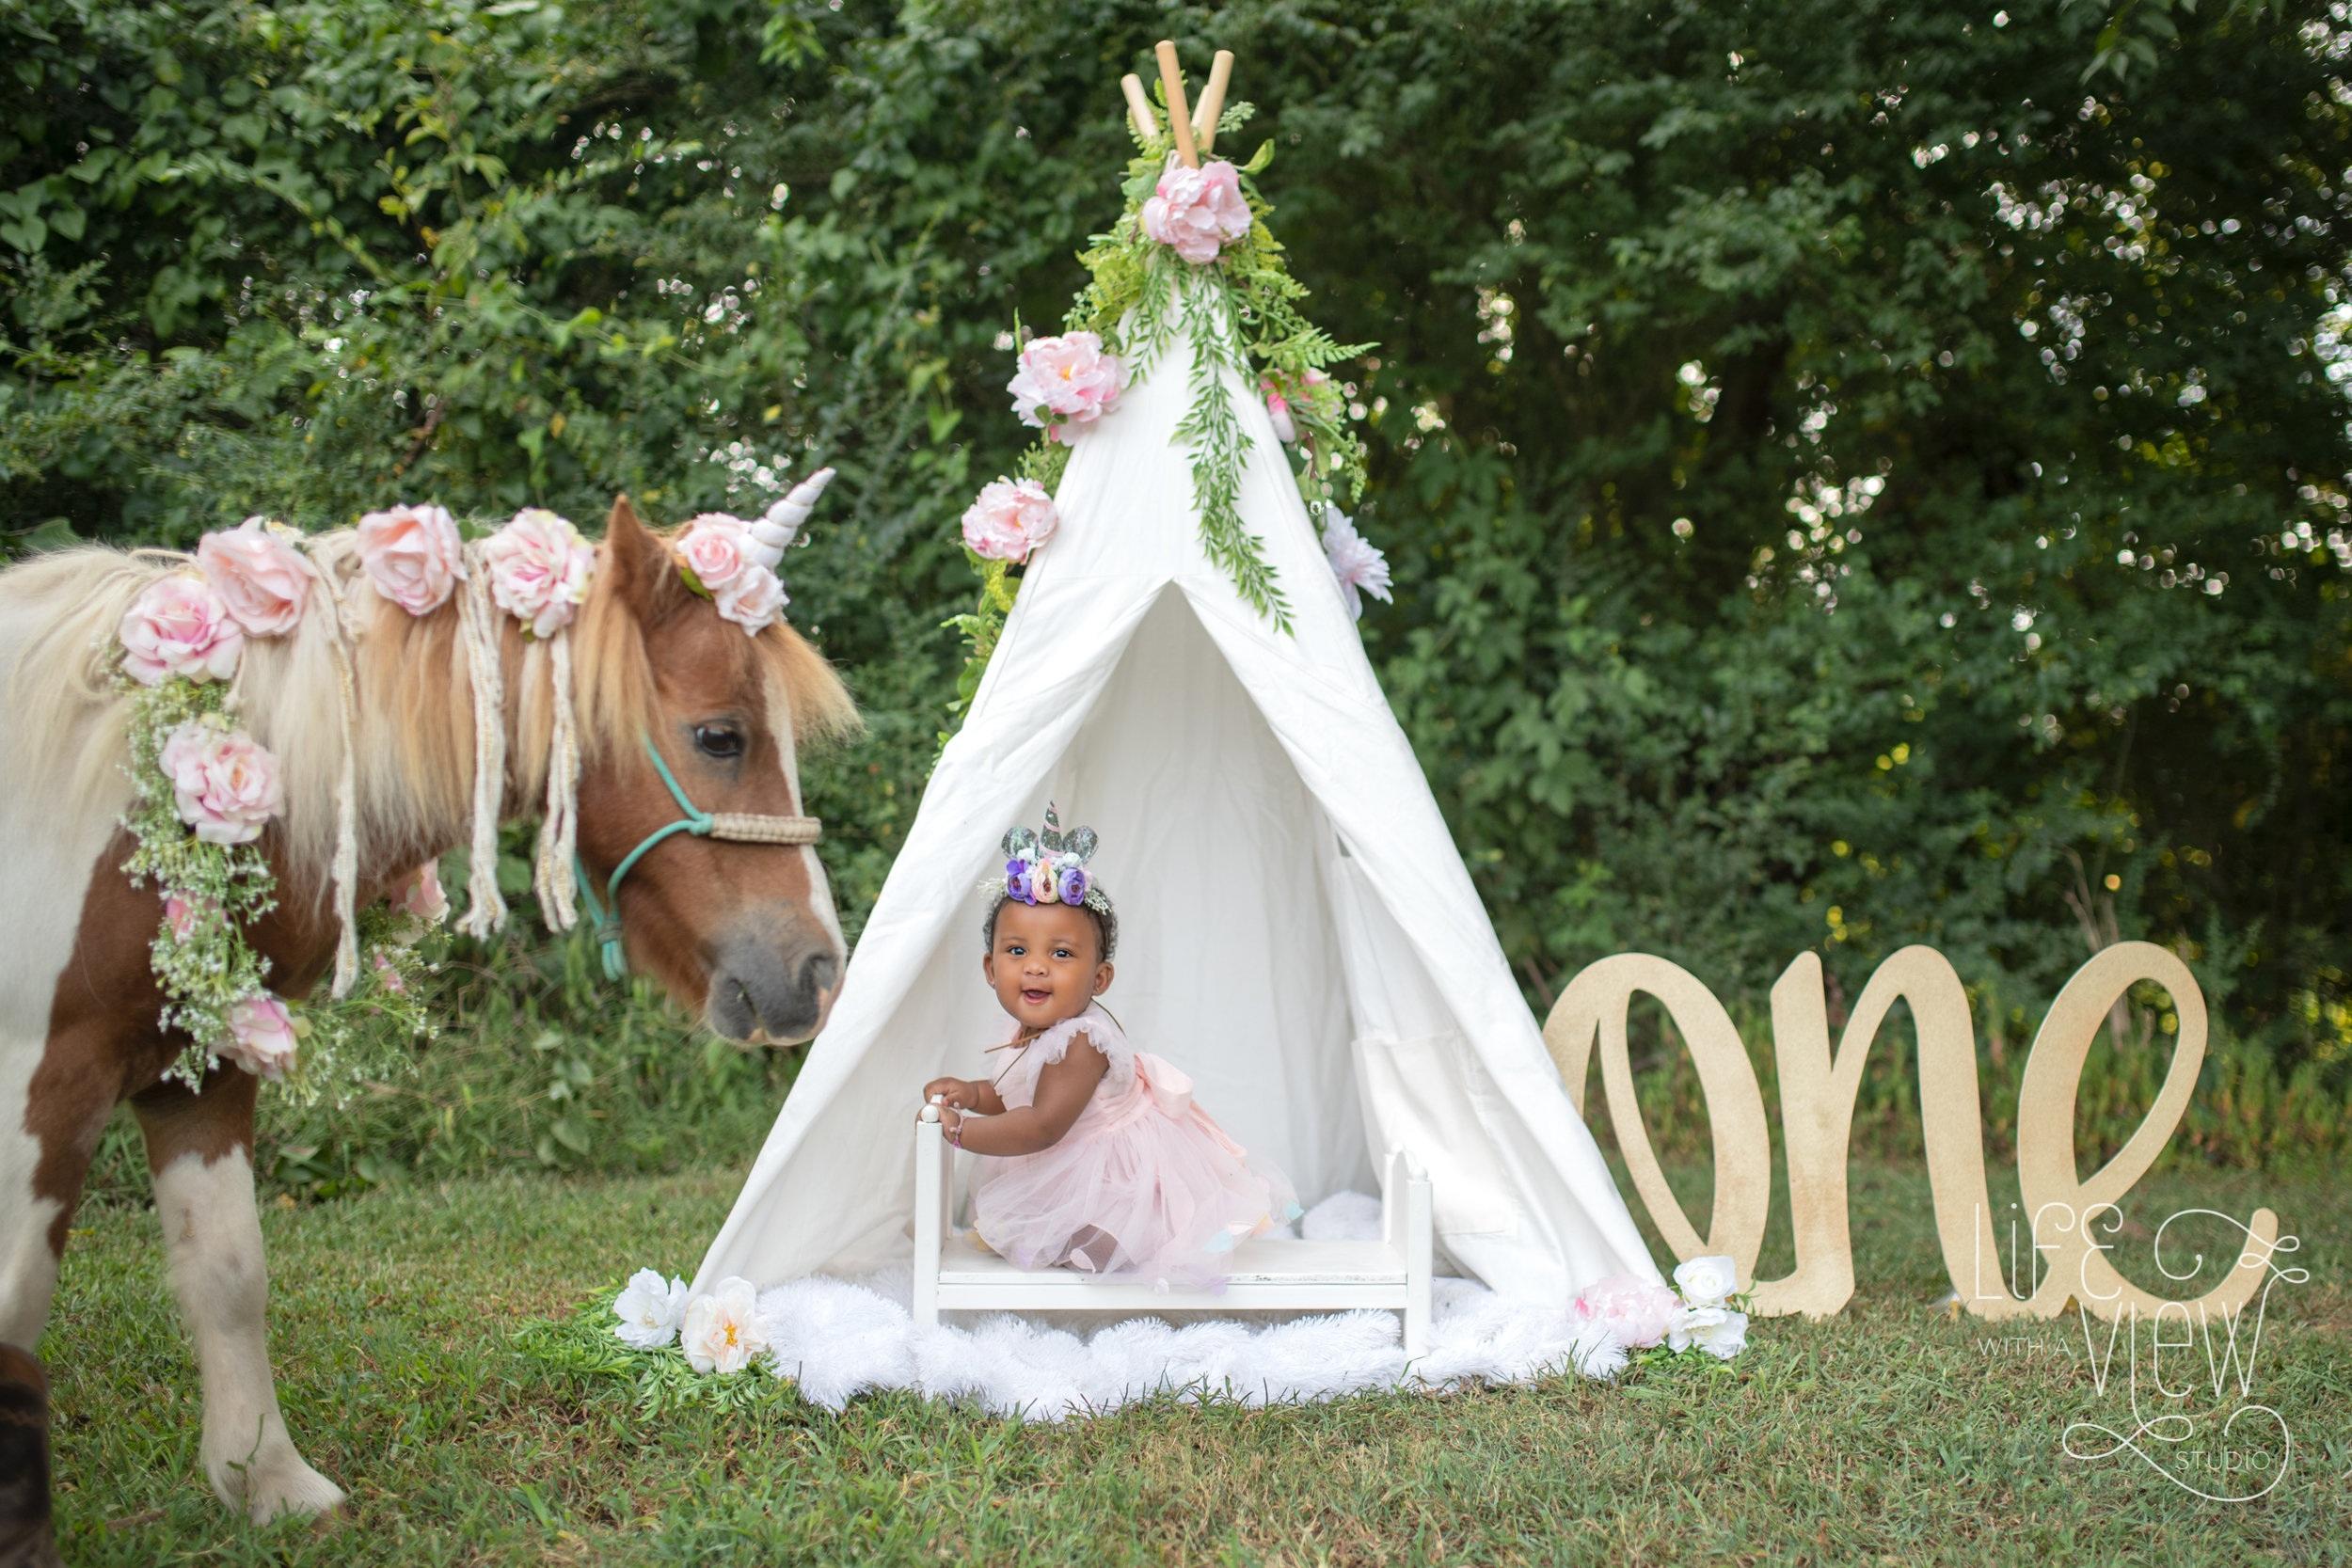 Chattanooga-Unicorn-Photos-1.jpg